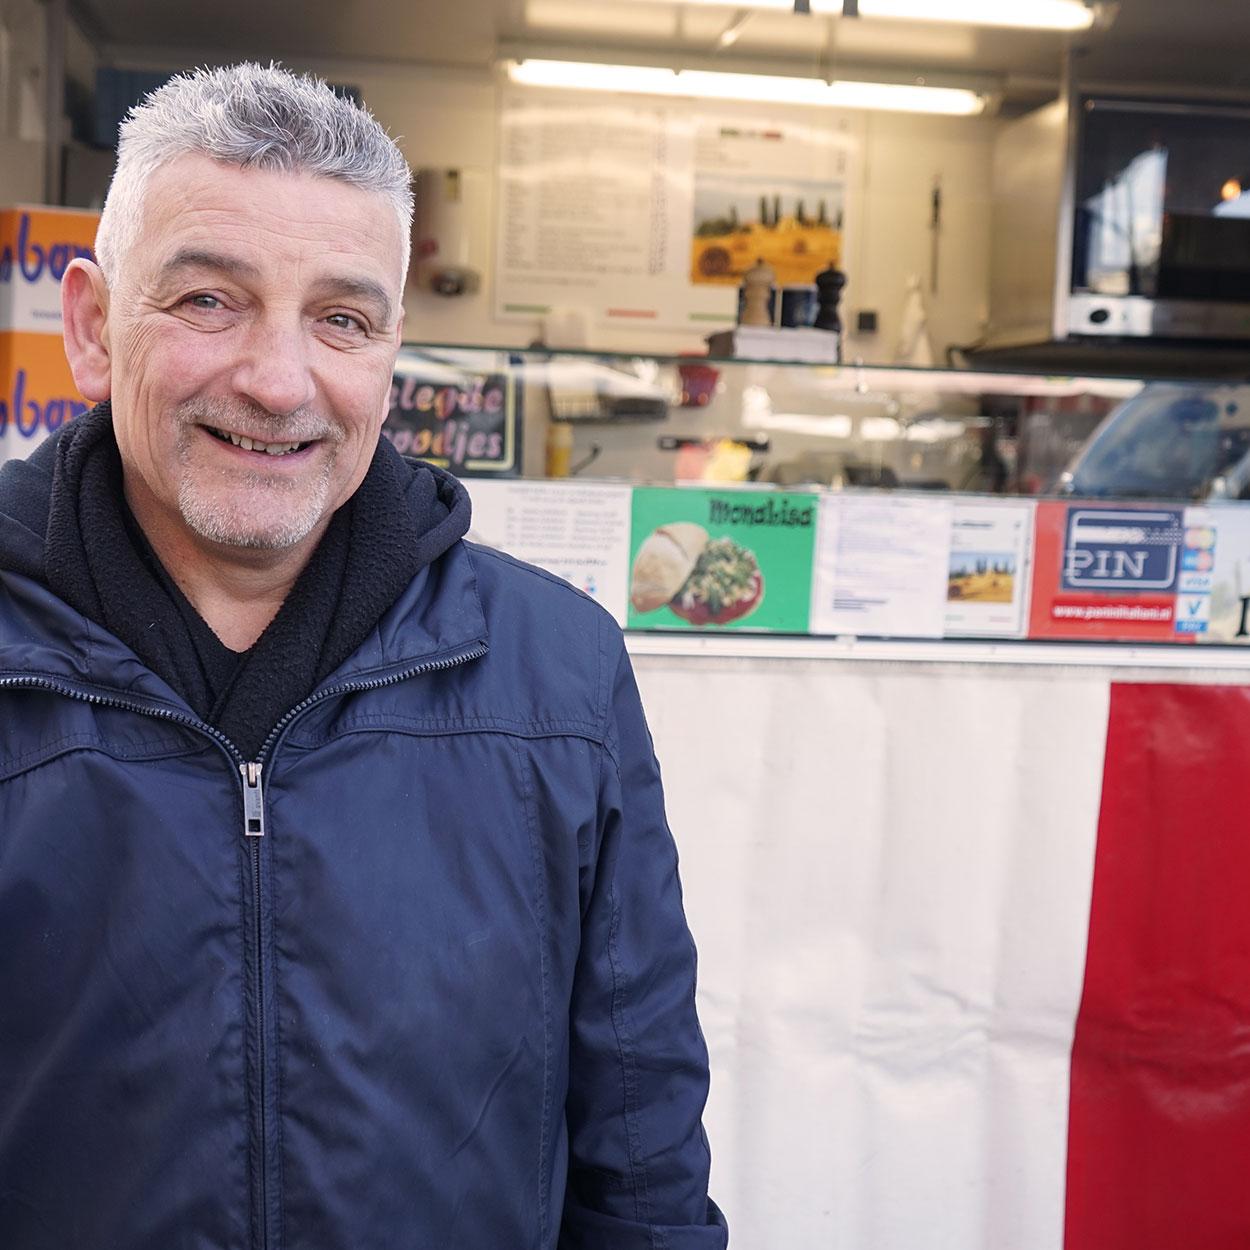 Panini Italiani